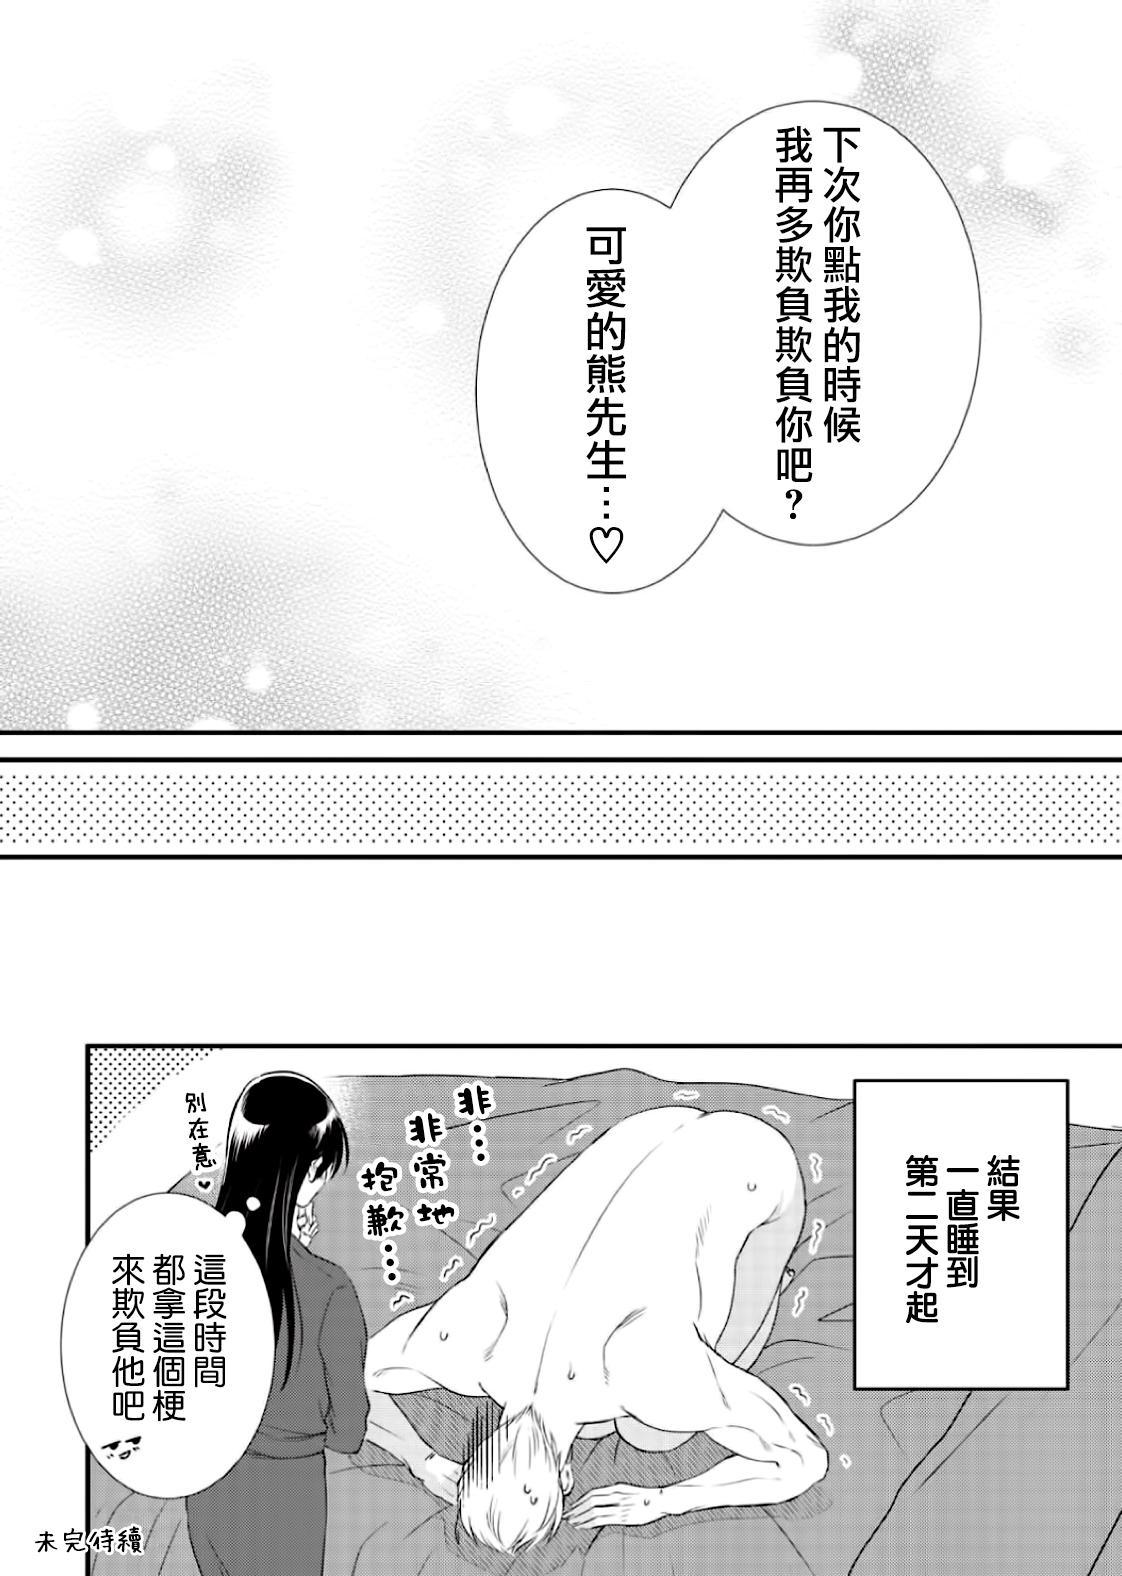 [Aion Kiu] Ijimete Kudasai Omega-sama ch.1-2 [Chinese] [沒有漢化] [Digital] 30